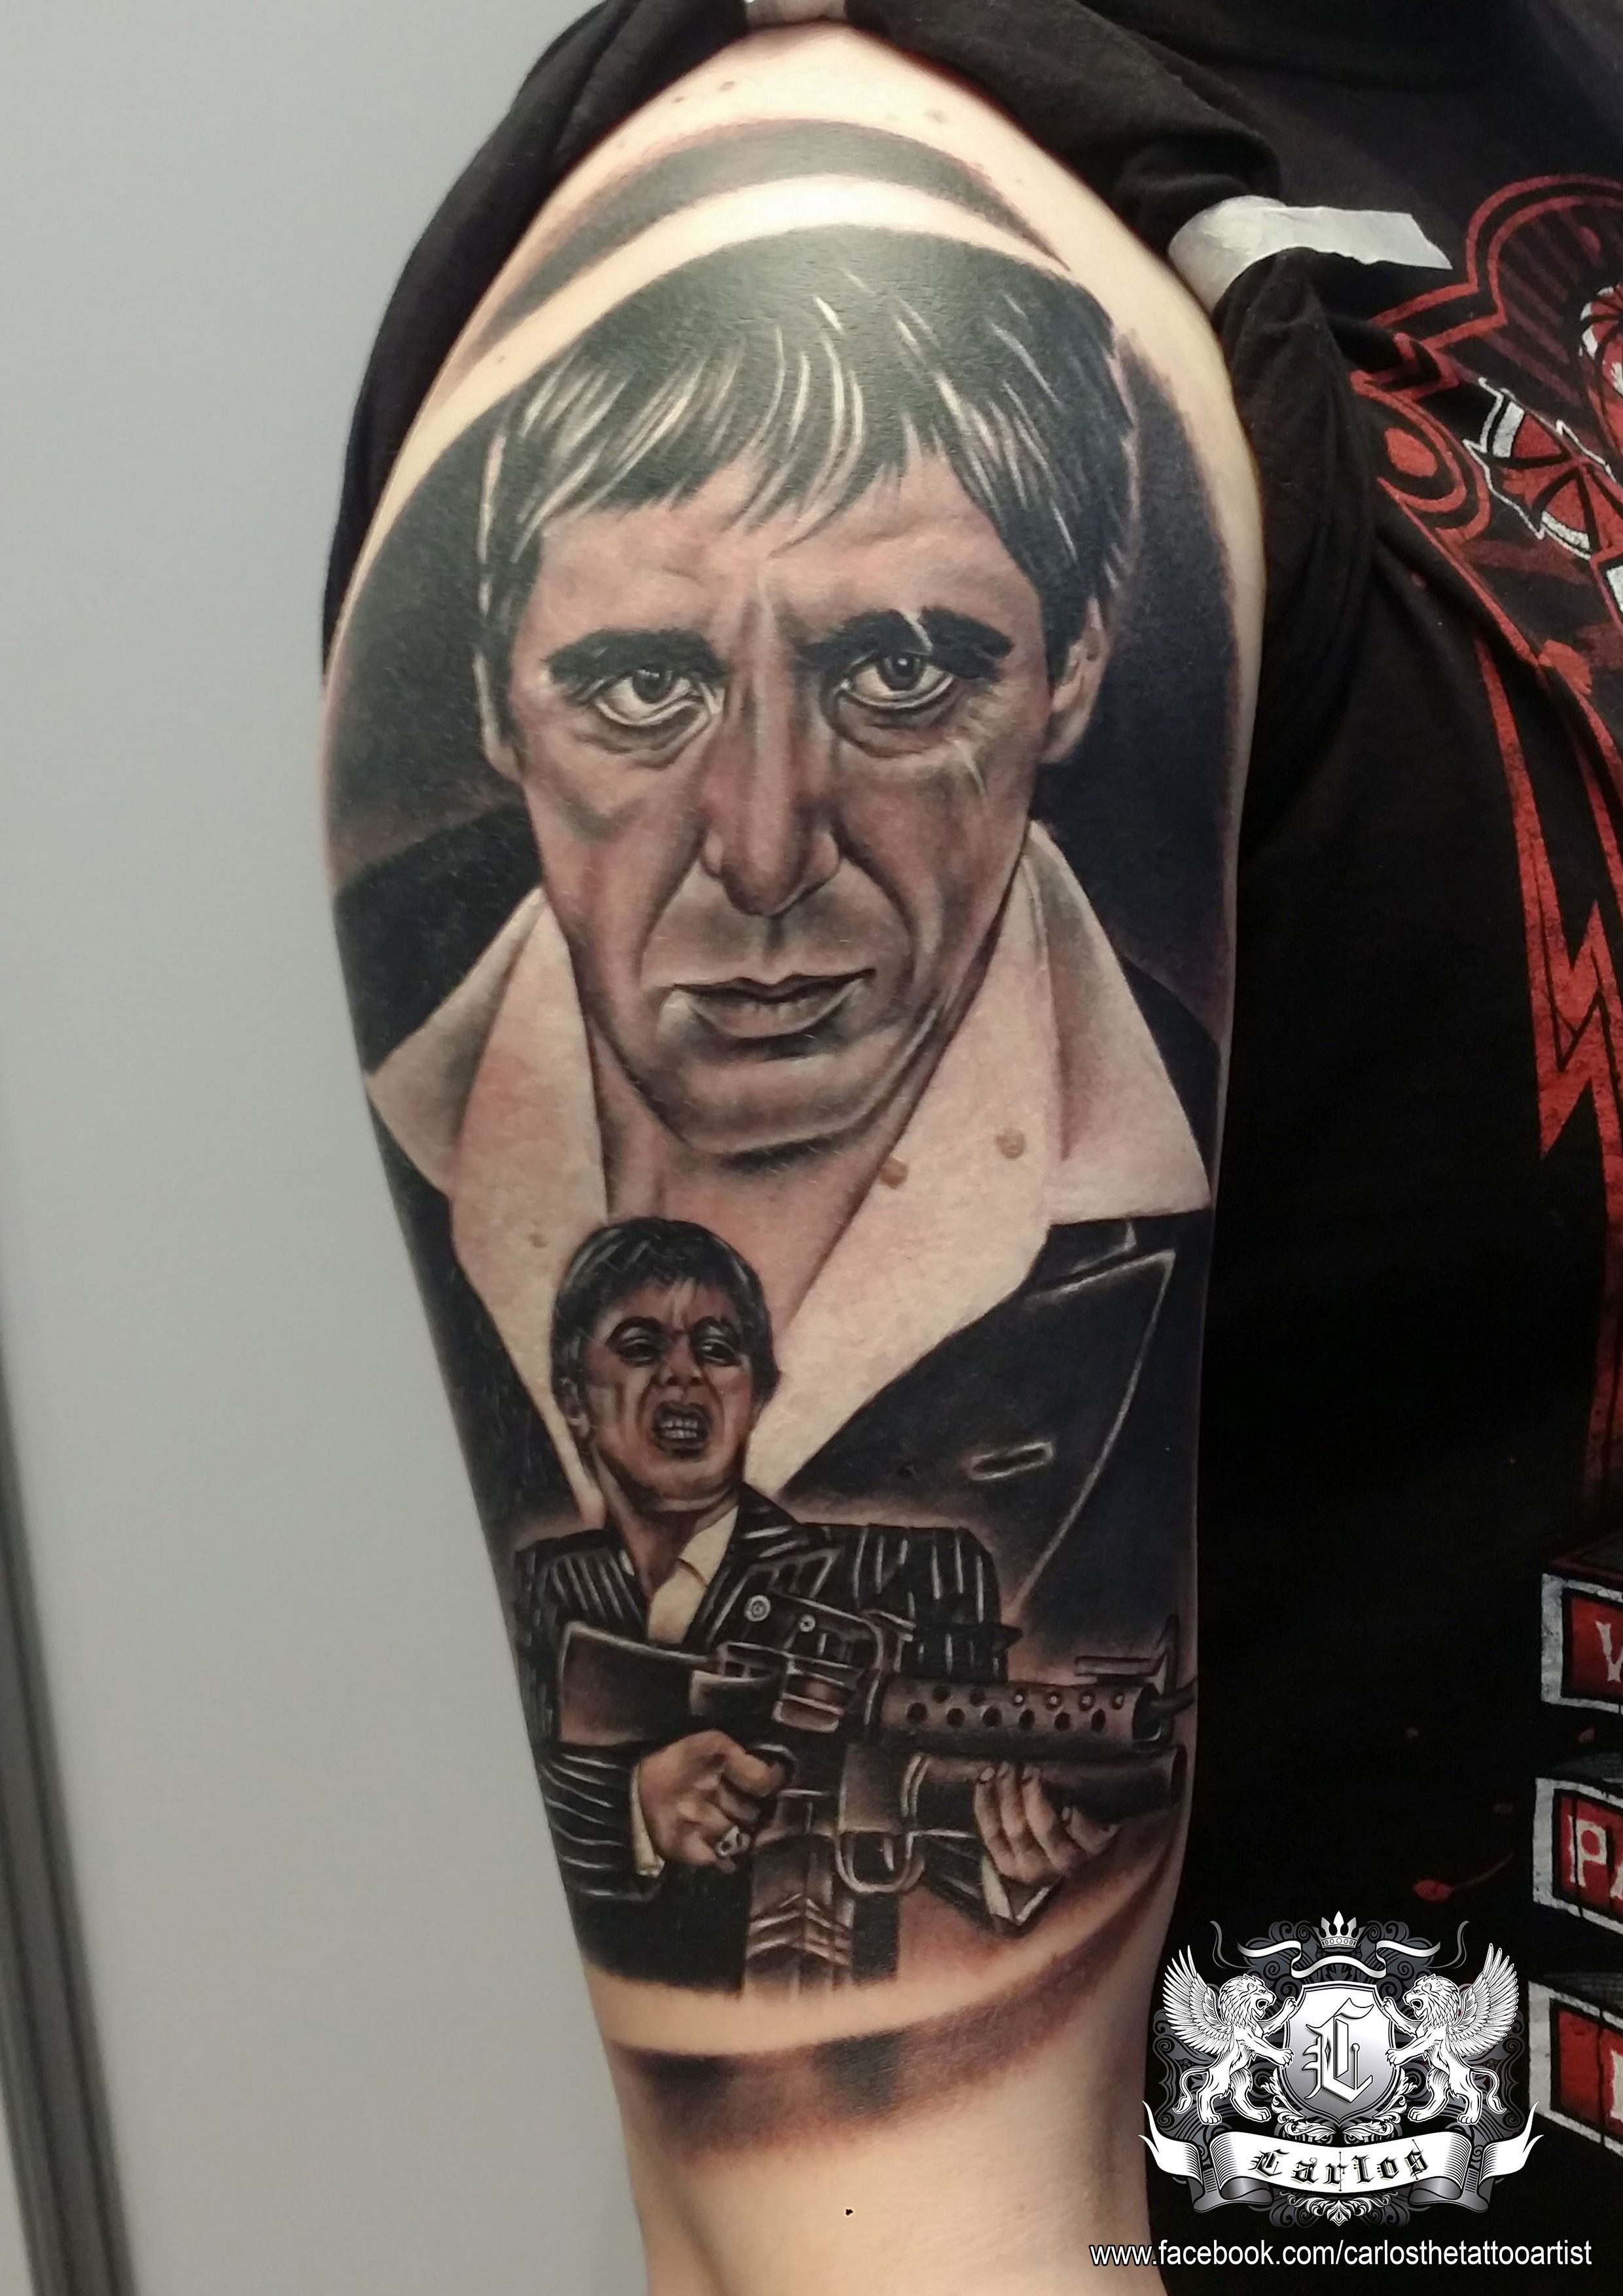 Tony Montana, Al Pacino, Black and Grey tattoo, Realistic tattoo ... - Tattoo Studio Freiburg